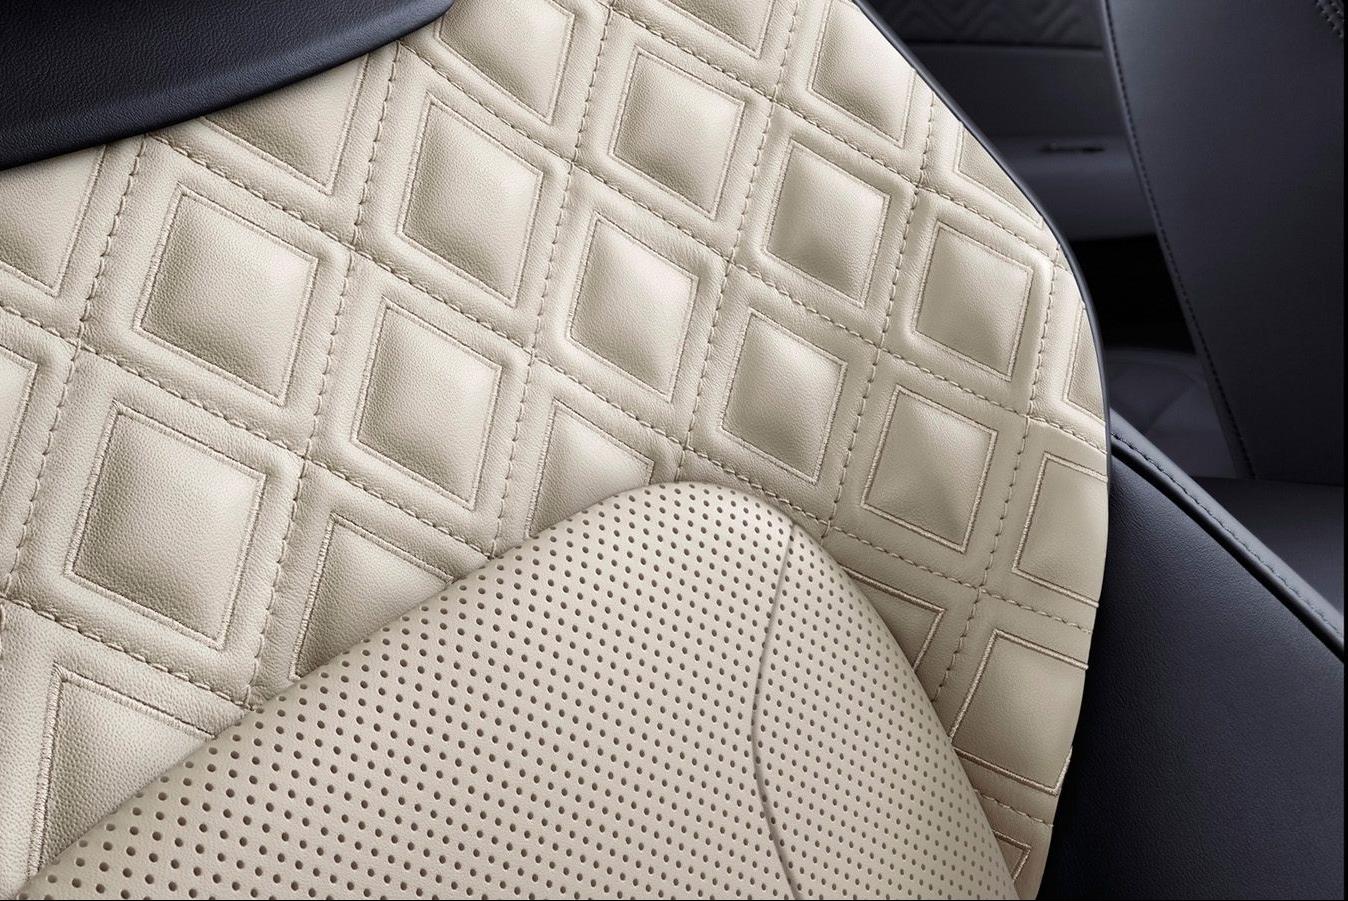 2018-Bentley-Continental-GT-Interior-6-1440x900